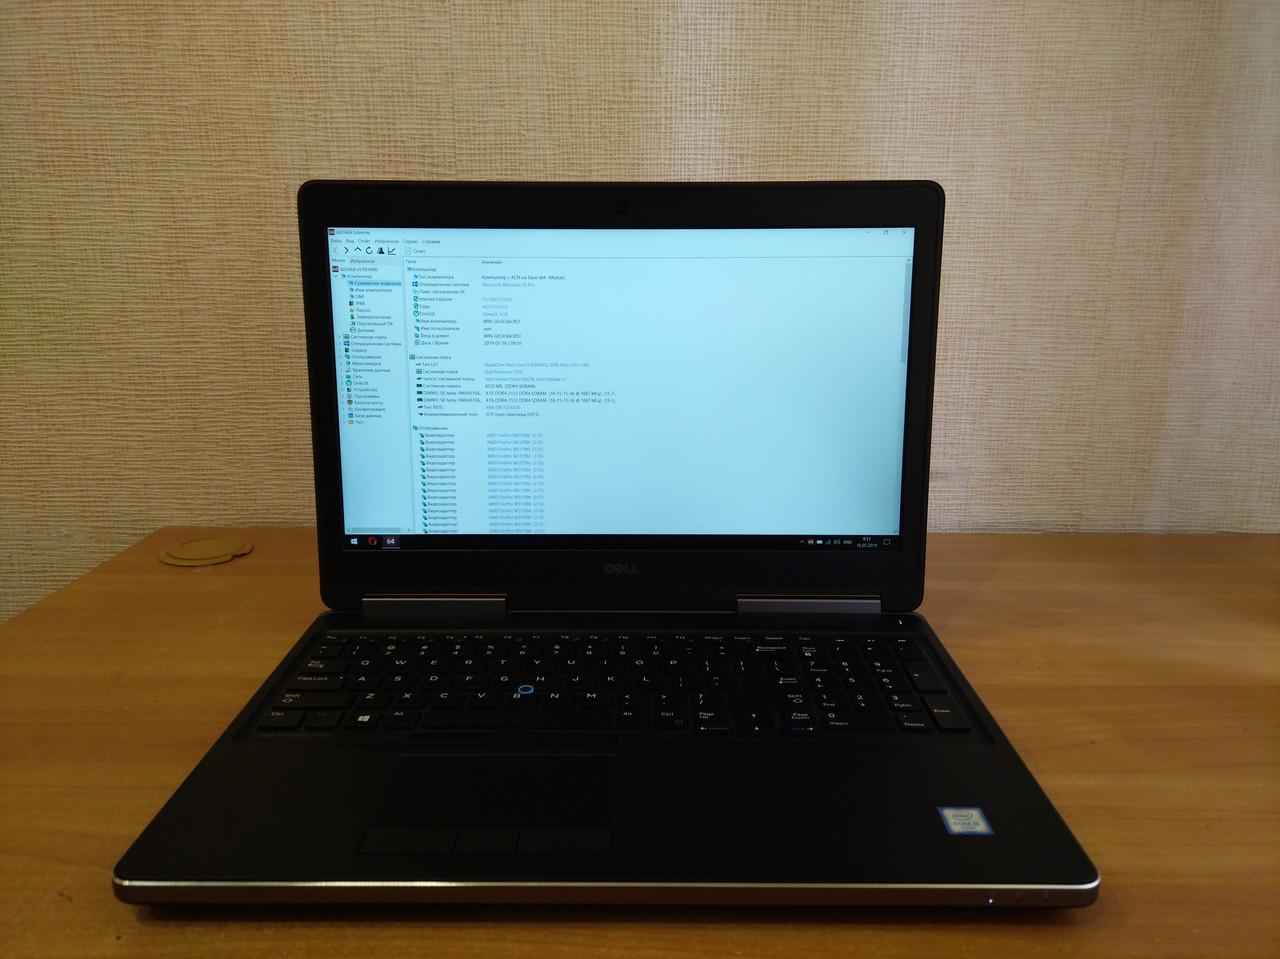 Dell precision 7510 15' FHD IPS / i5 6300HQ / 500Gb/ firePro w5170m